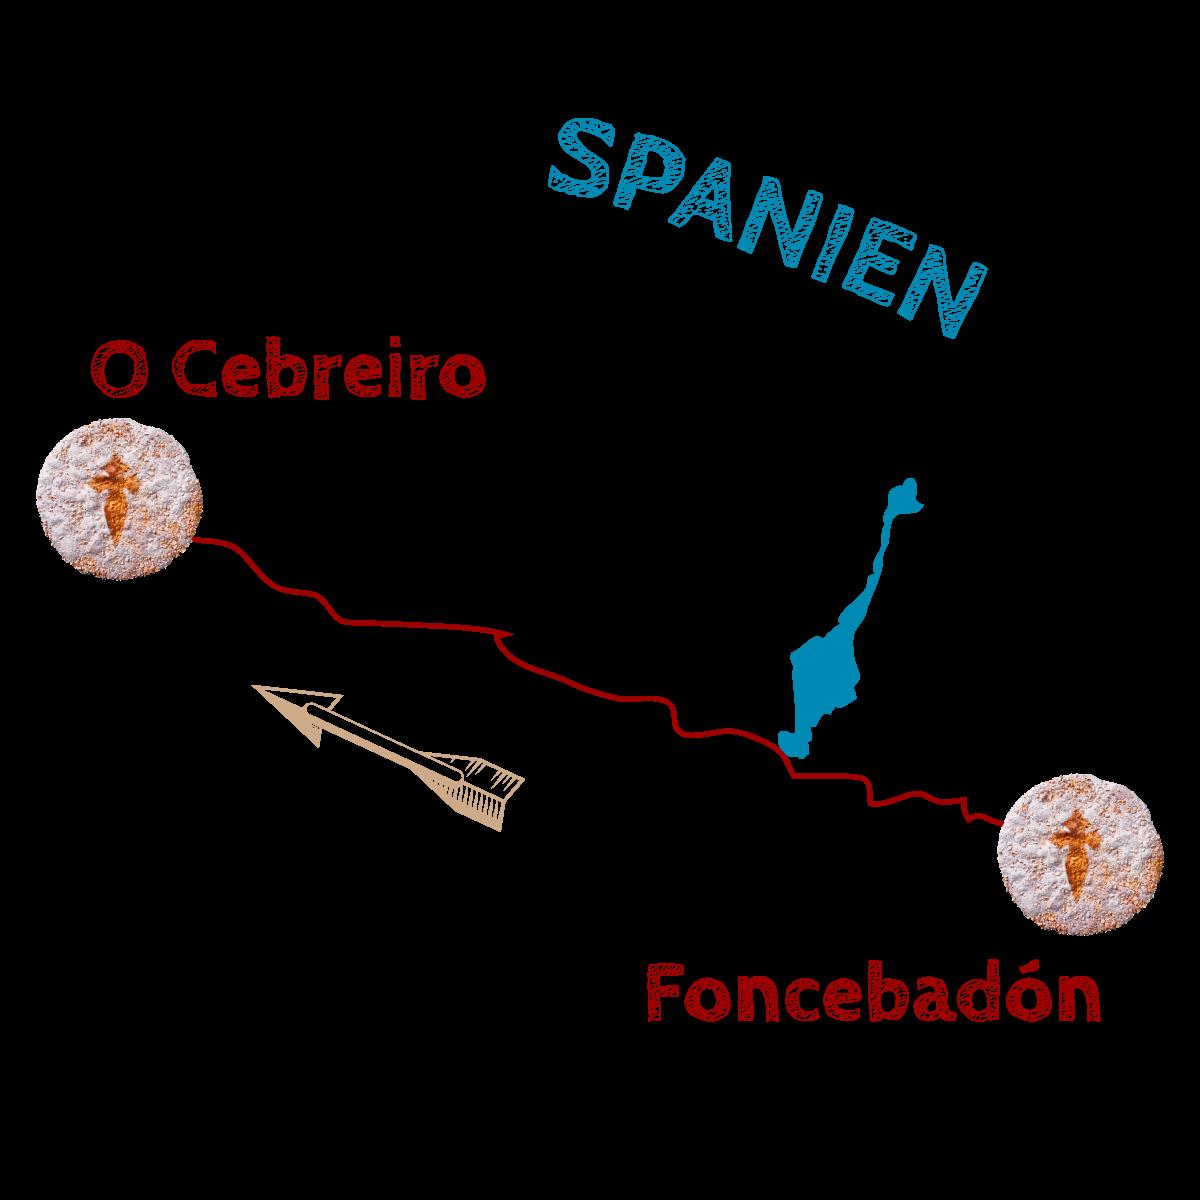 Foncebadon-O-Cebreiro-Spanien